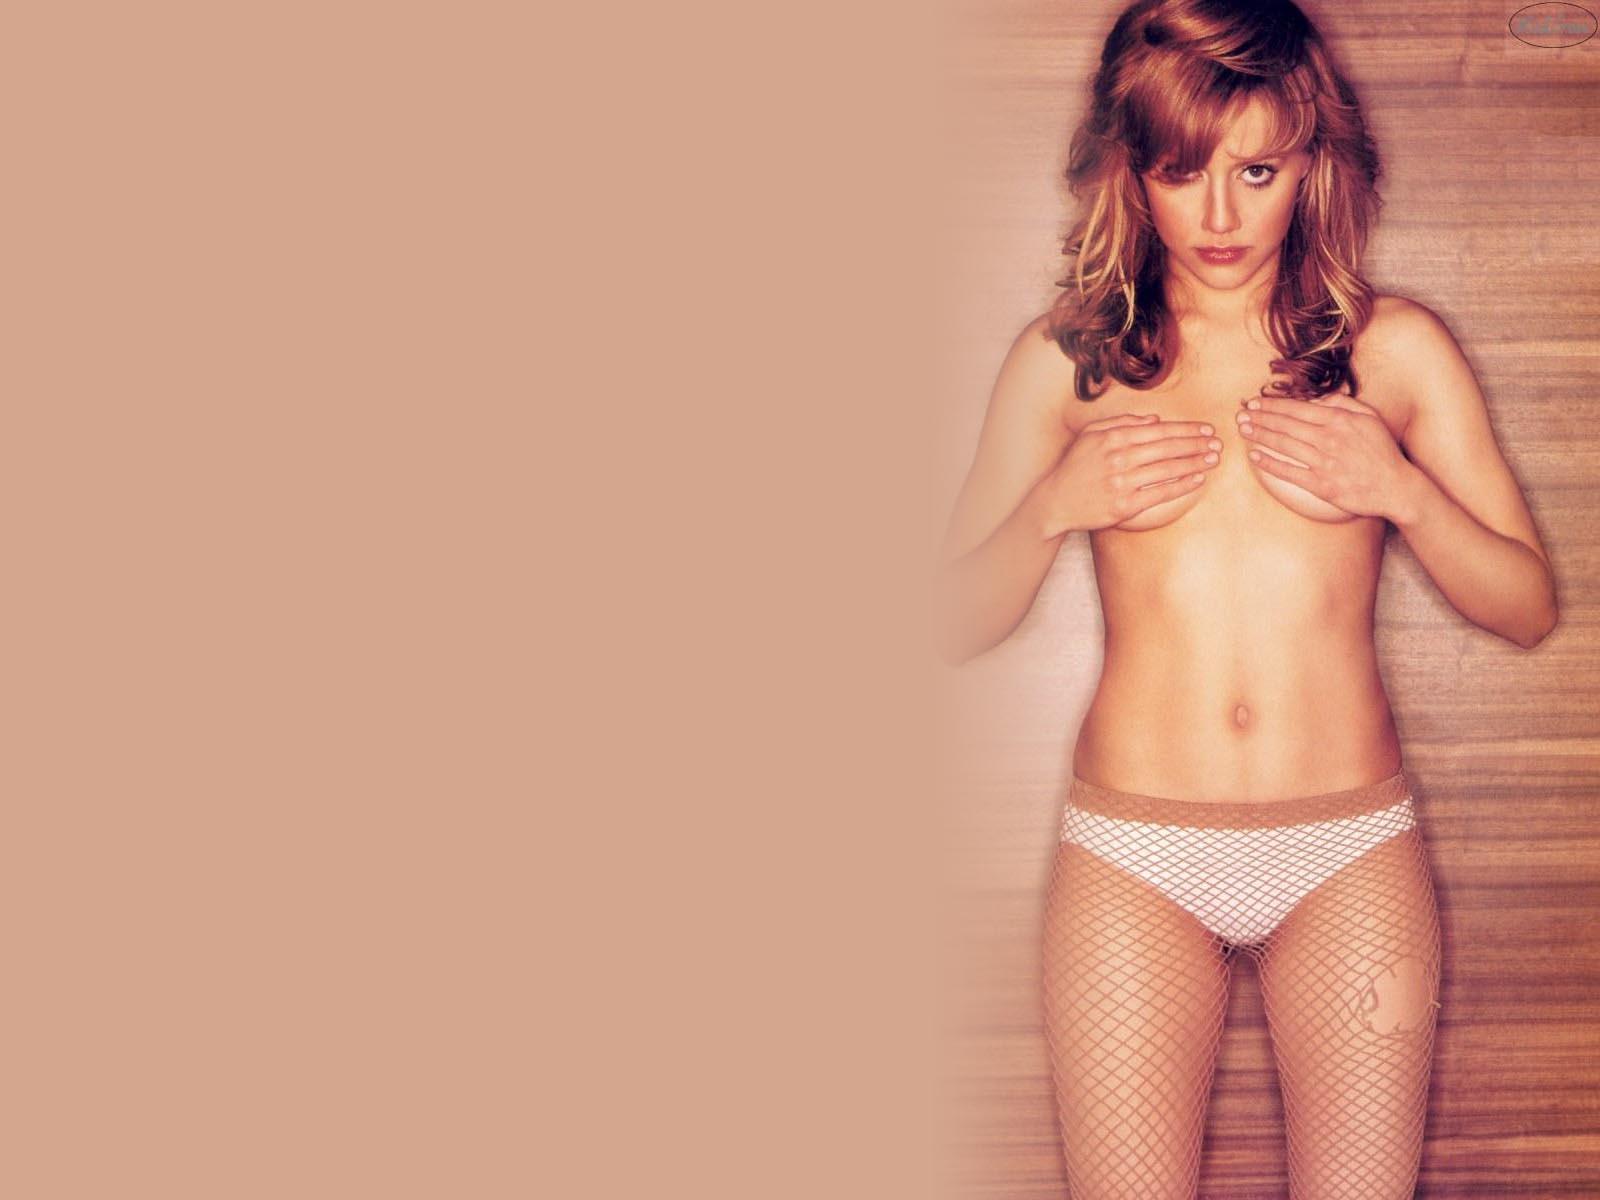 Brittney murphy bikini